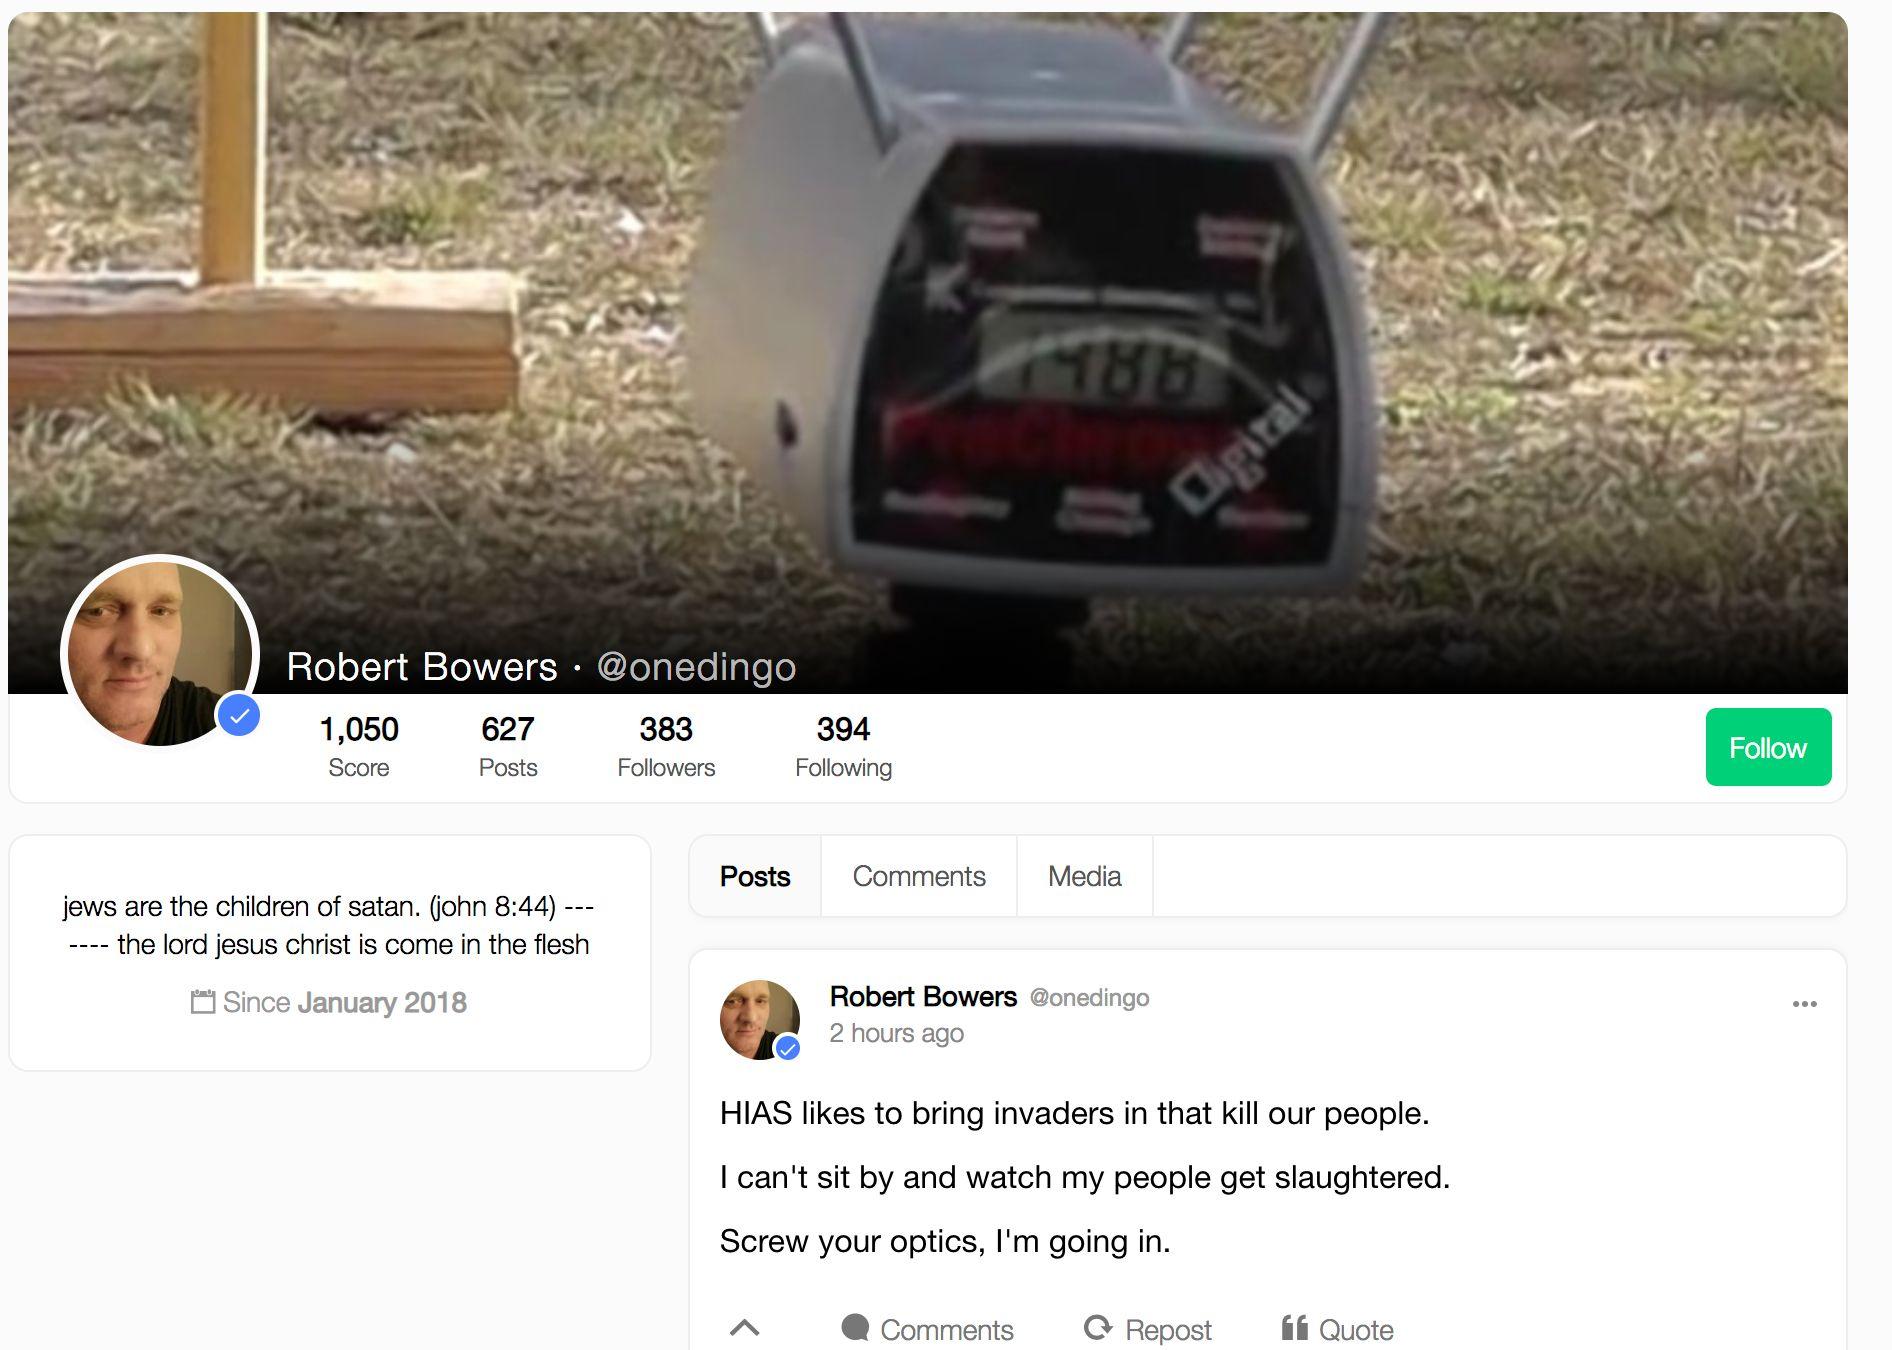 A screenshot shows alleged shooter Robert Bowers' profile on Gab, a social media platform popular among...